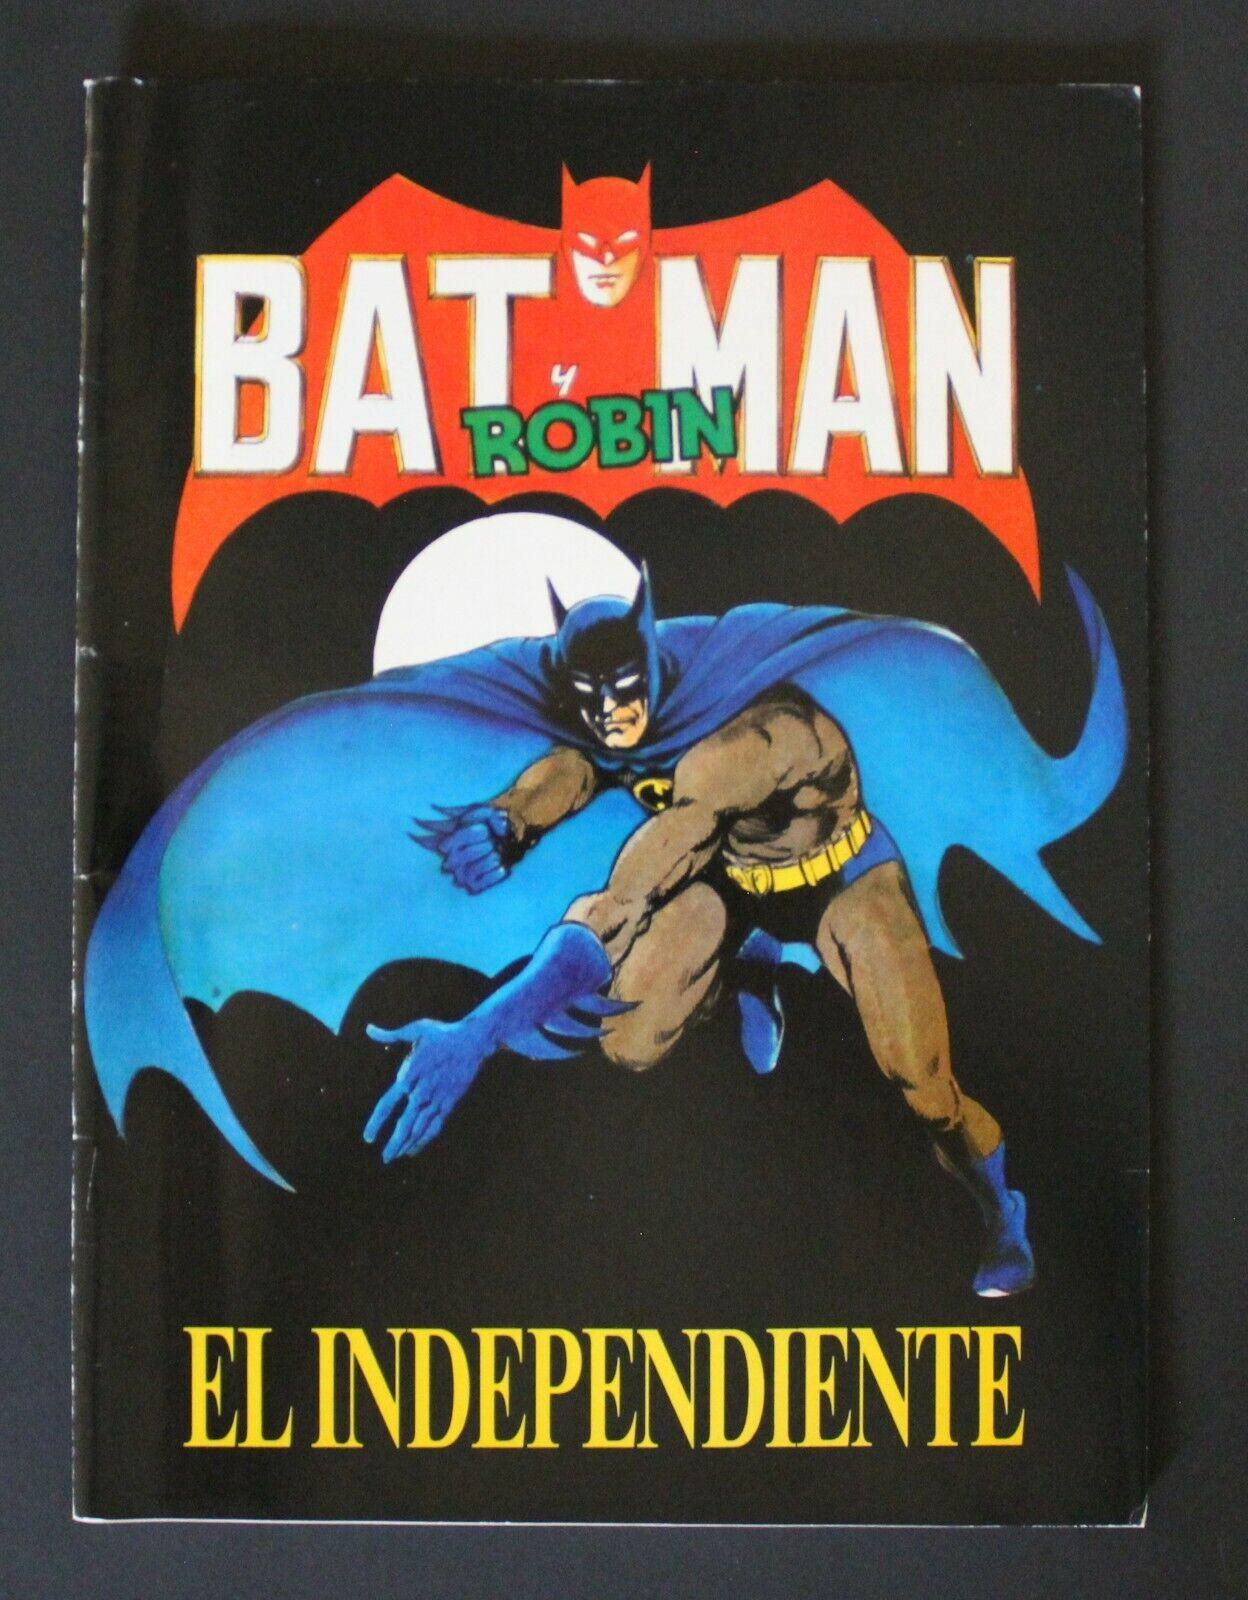 1990 Independiente BATMAN & ROBIN trading cards comic strips vintage empty album